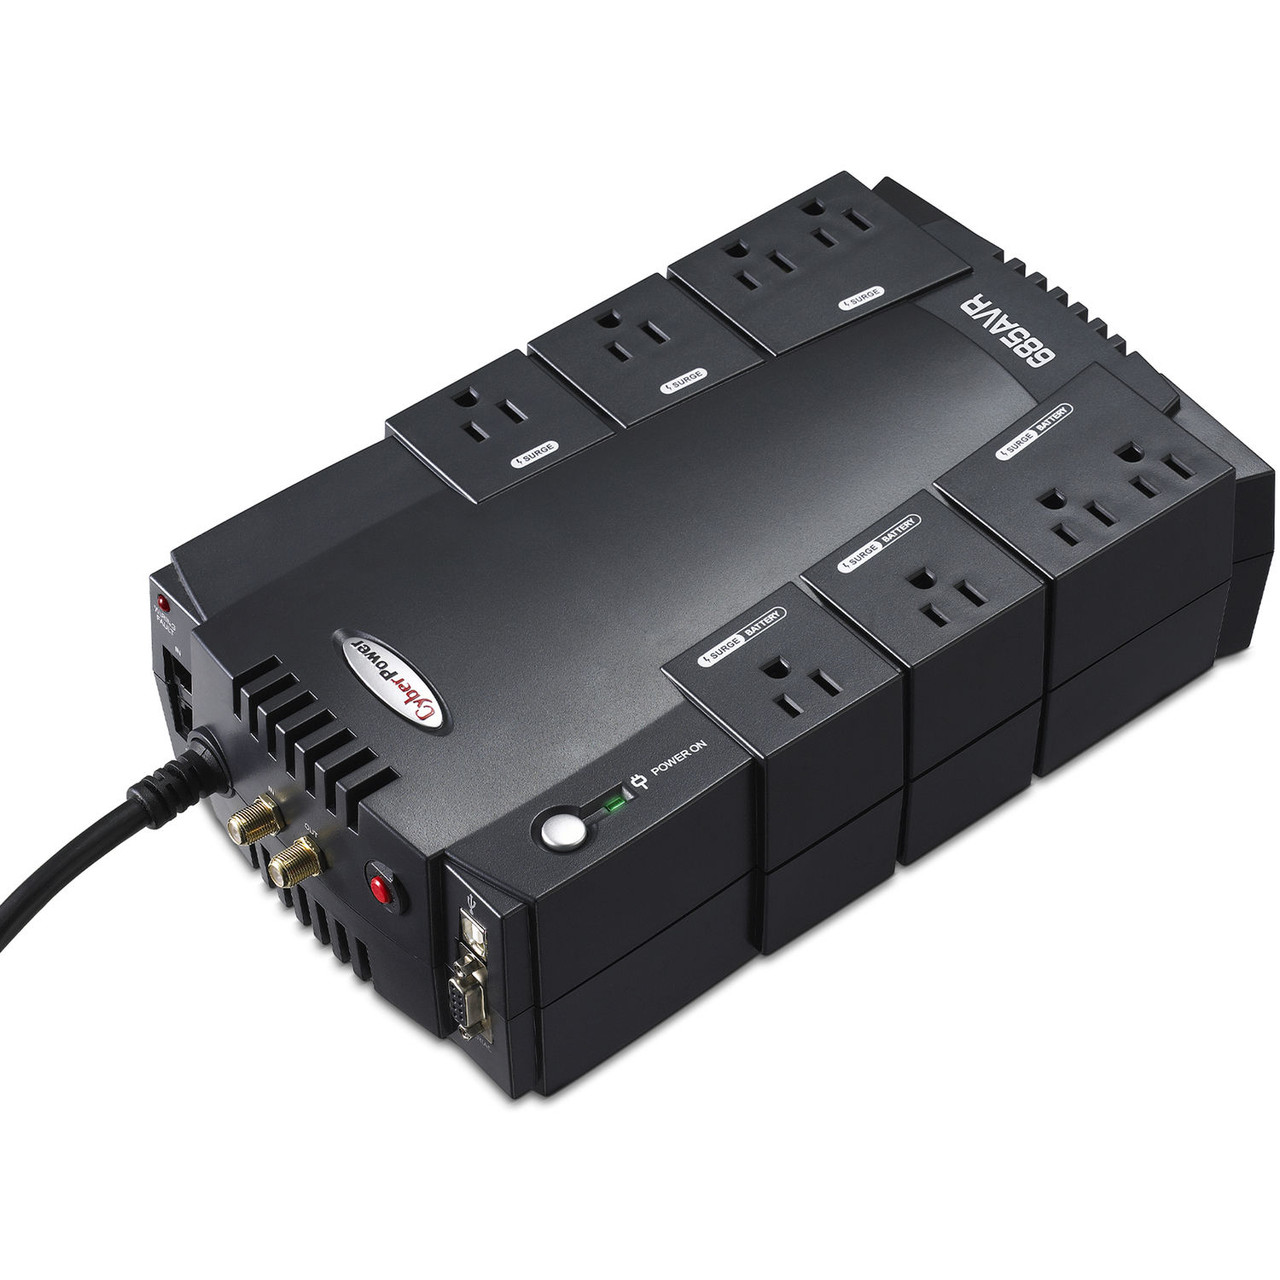 CyberPower CP685AVR-G-R 685VA/390W Compact Uninterruptible Power Supply - Certified Refurbished